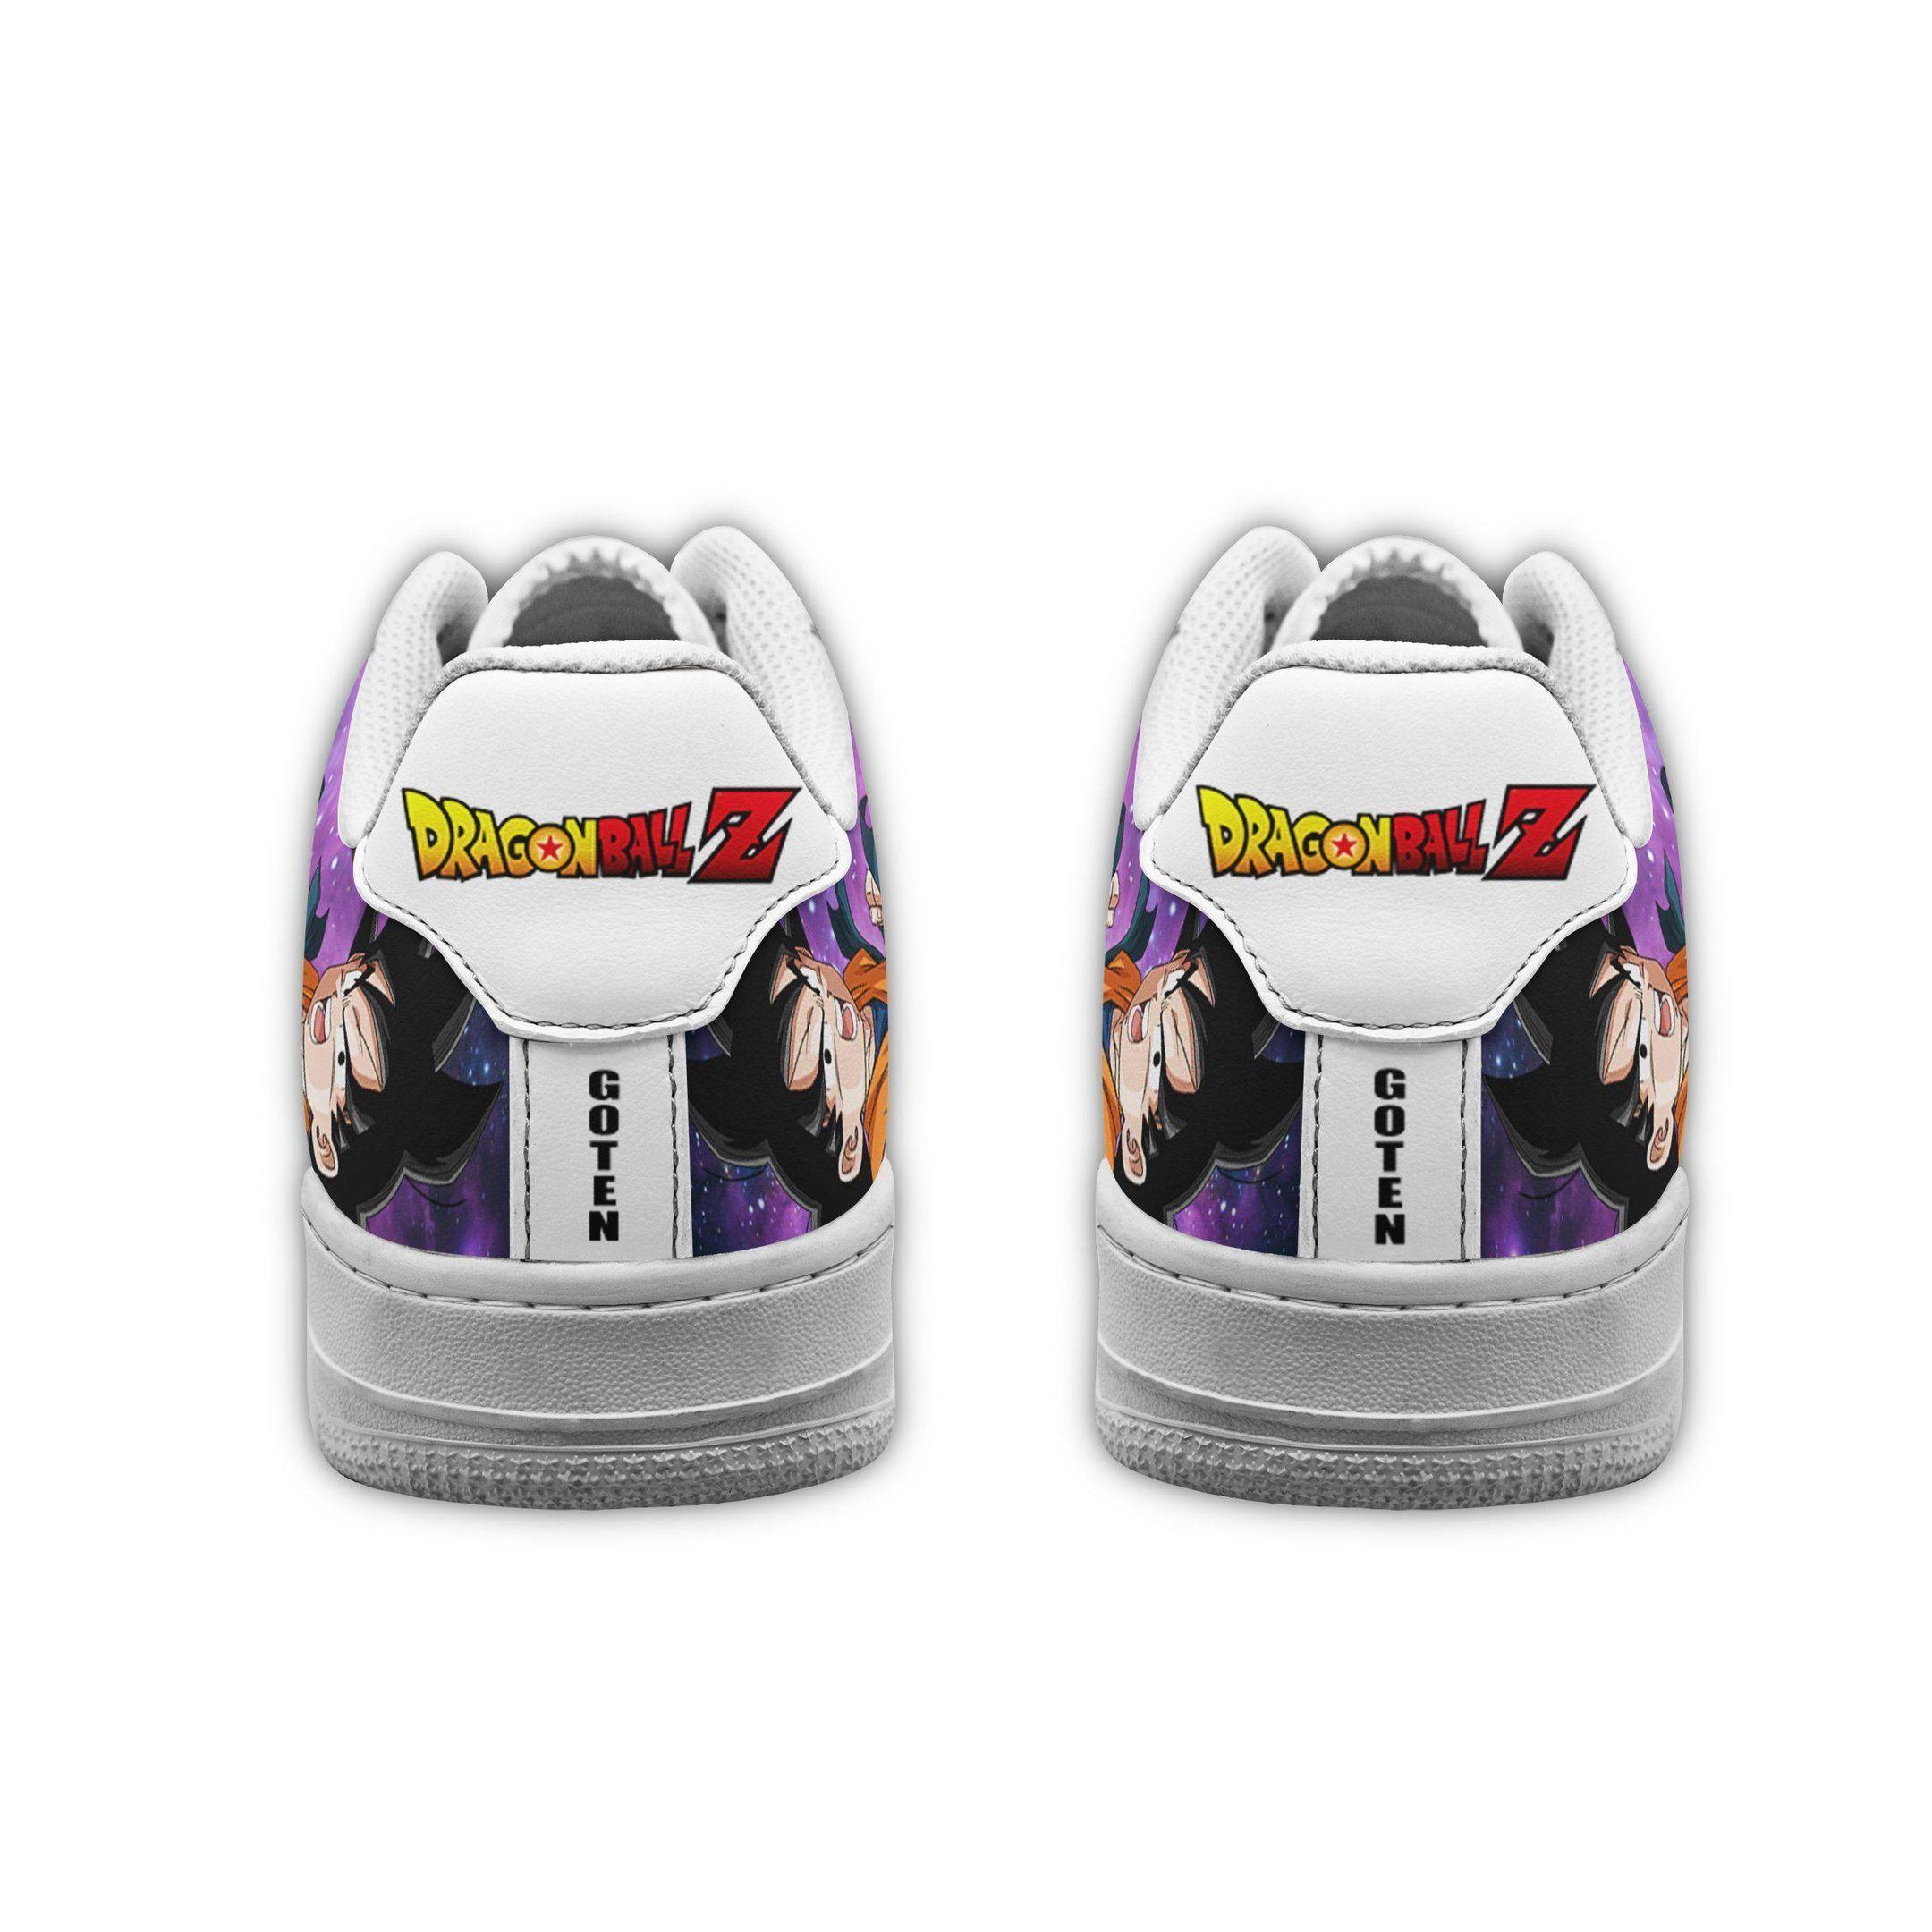 Goten Air Shoes Dragon Ball Z Anime Shoes Fan Gift GO1012